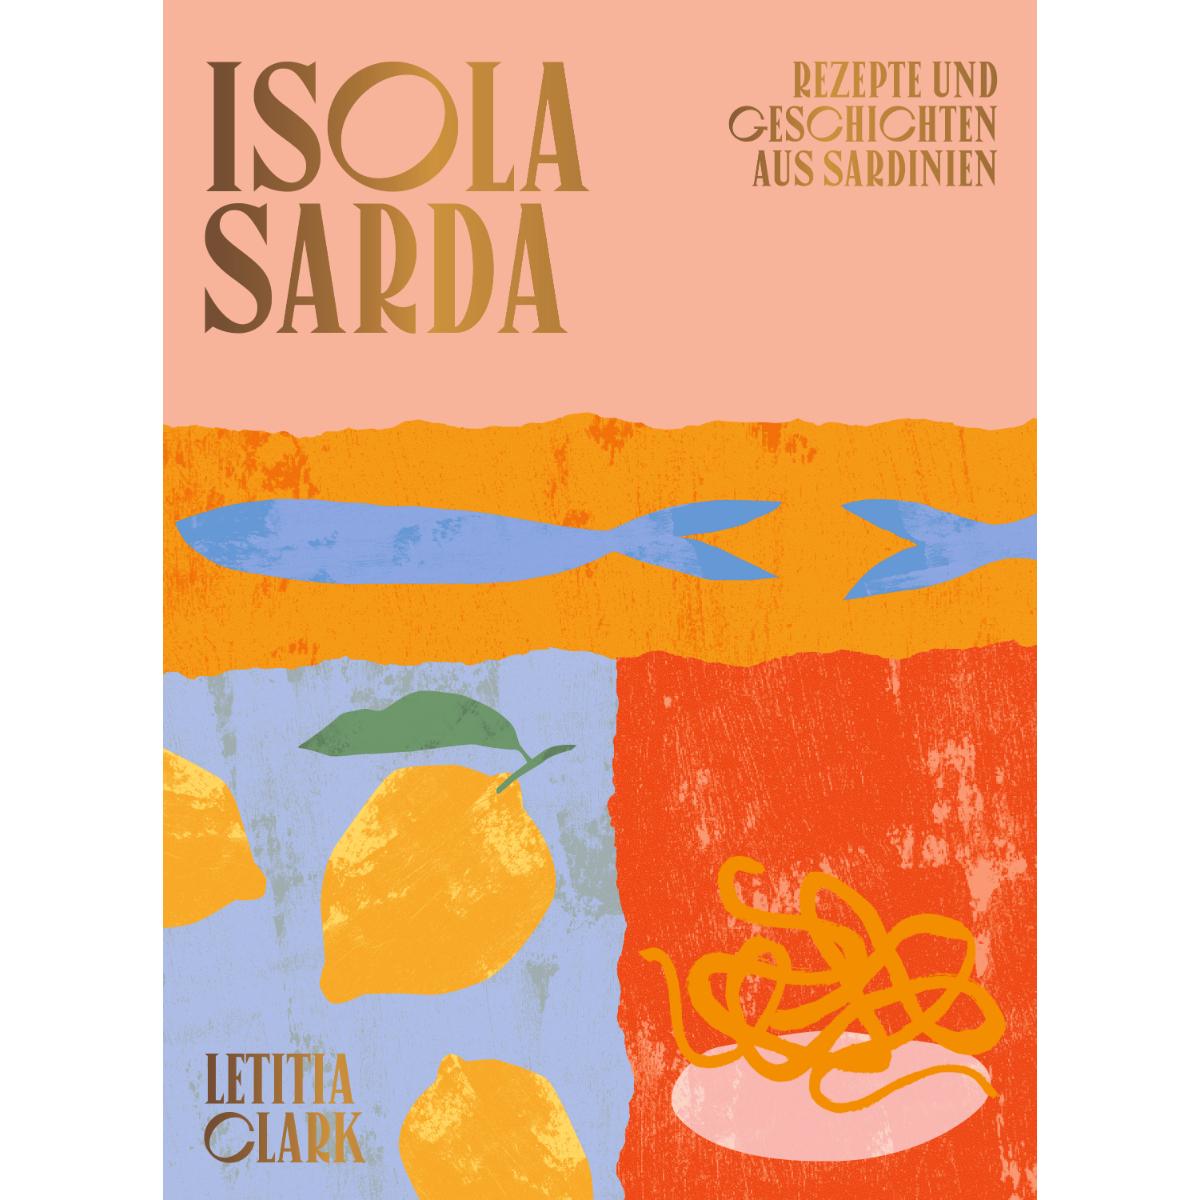 Isola Sarda Letitia Clark